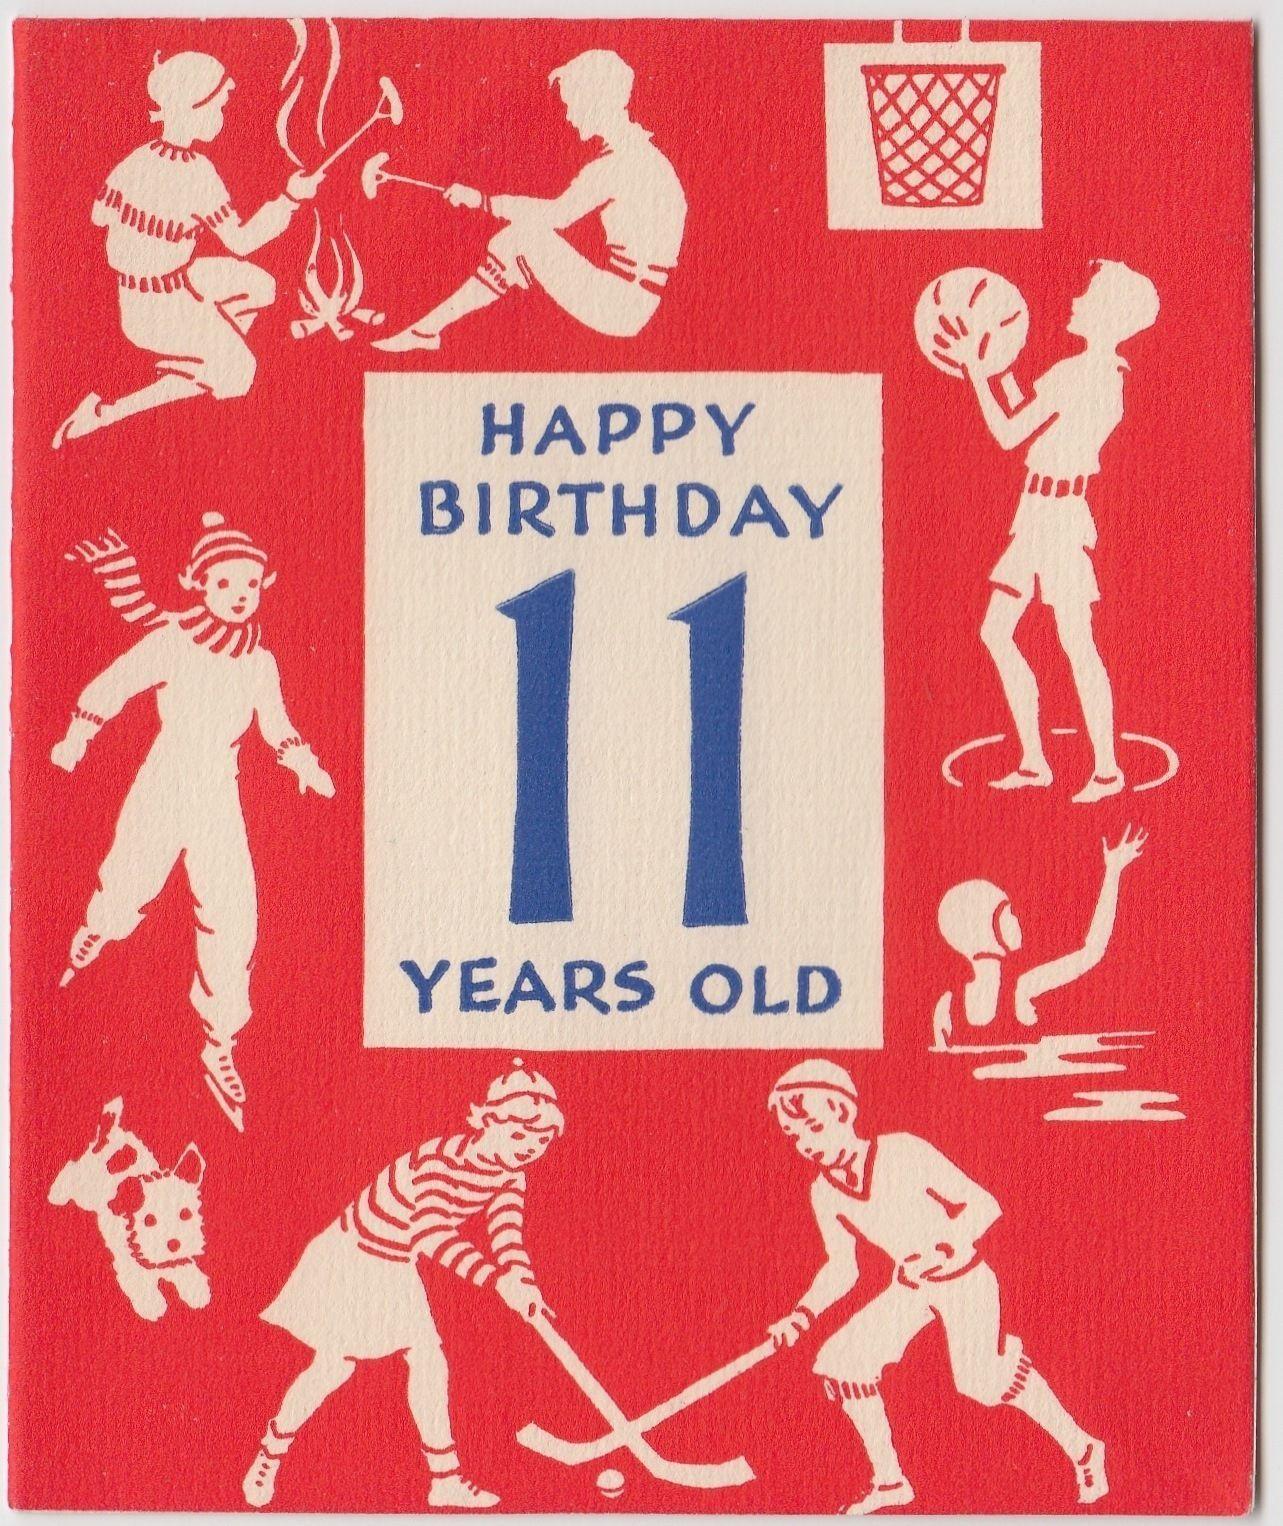 Vintage Greeting Card 11th Birthday Sport Ice Skating Hockey Swimming Basketball | eBay